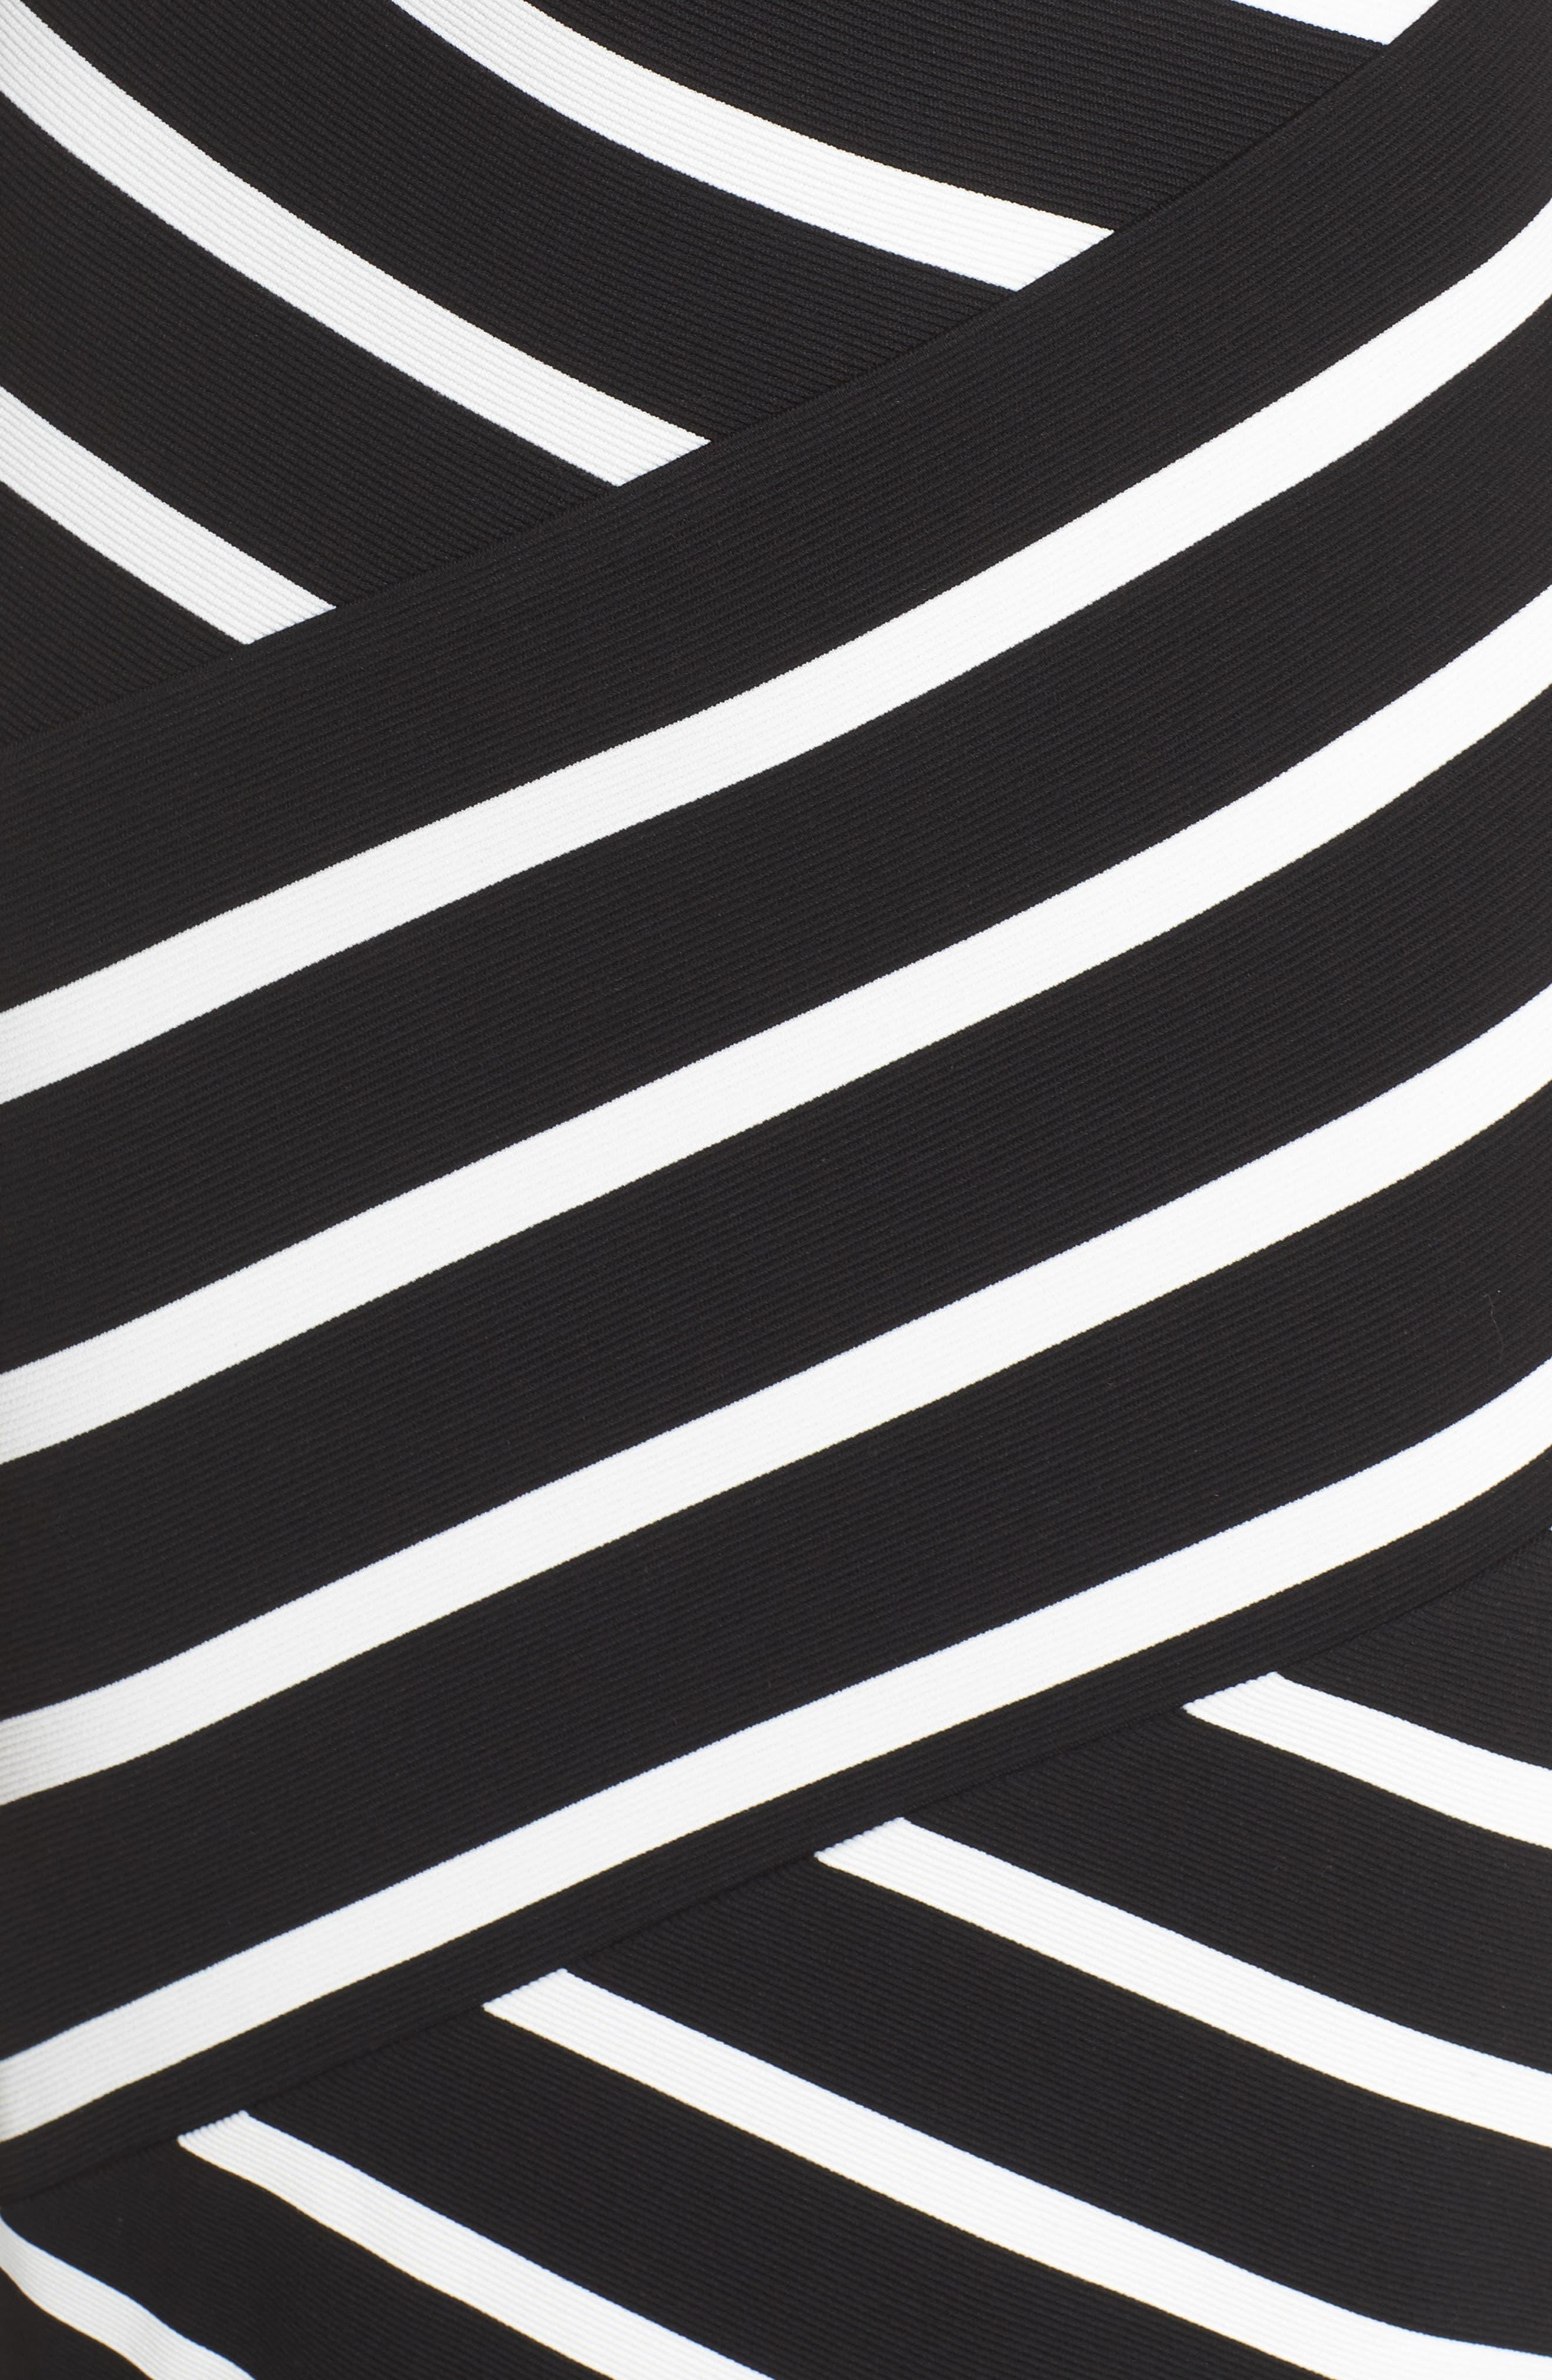 Stripe Ottoman Sheath Dress,                             Alternate thumbnail 6, color,                             Black/ Ivory